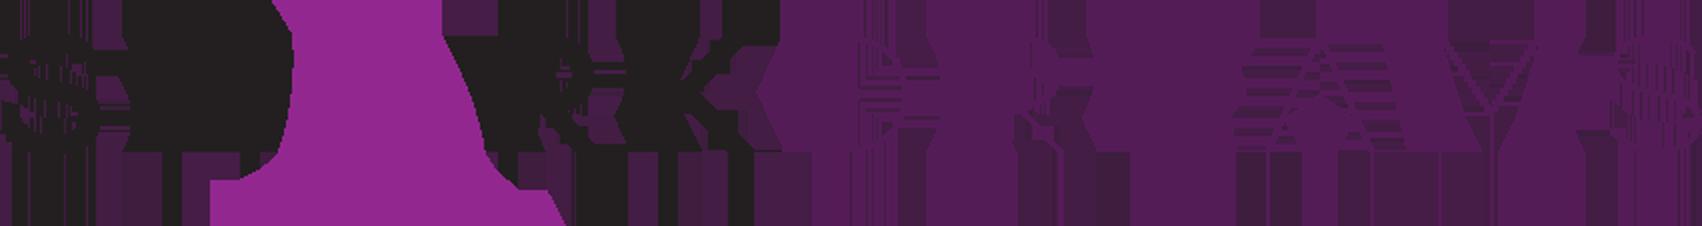 logo-6db07217a7a7a20bccd0dadd0fcd1454.png